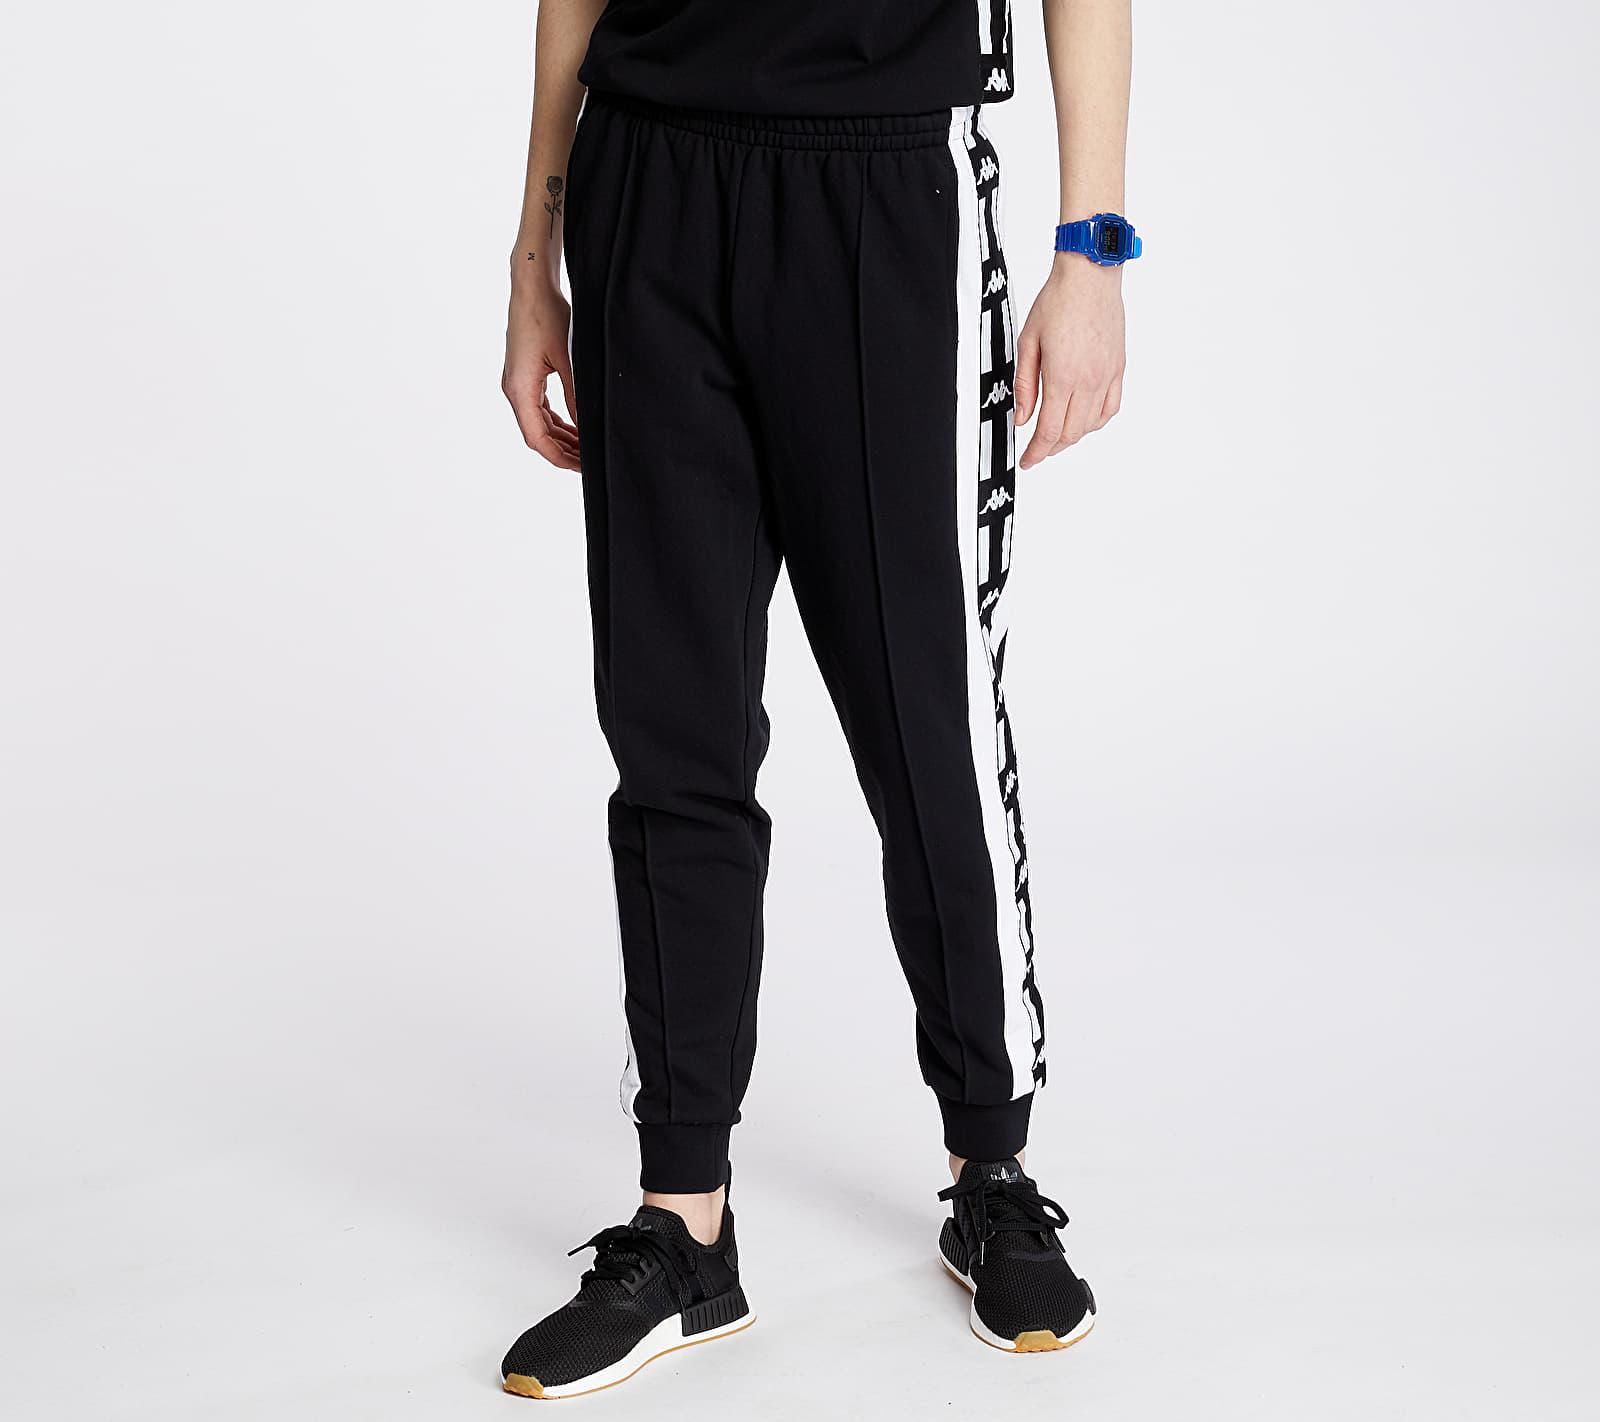 Kappa Authentic La Ciovan Pants Black/ White